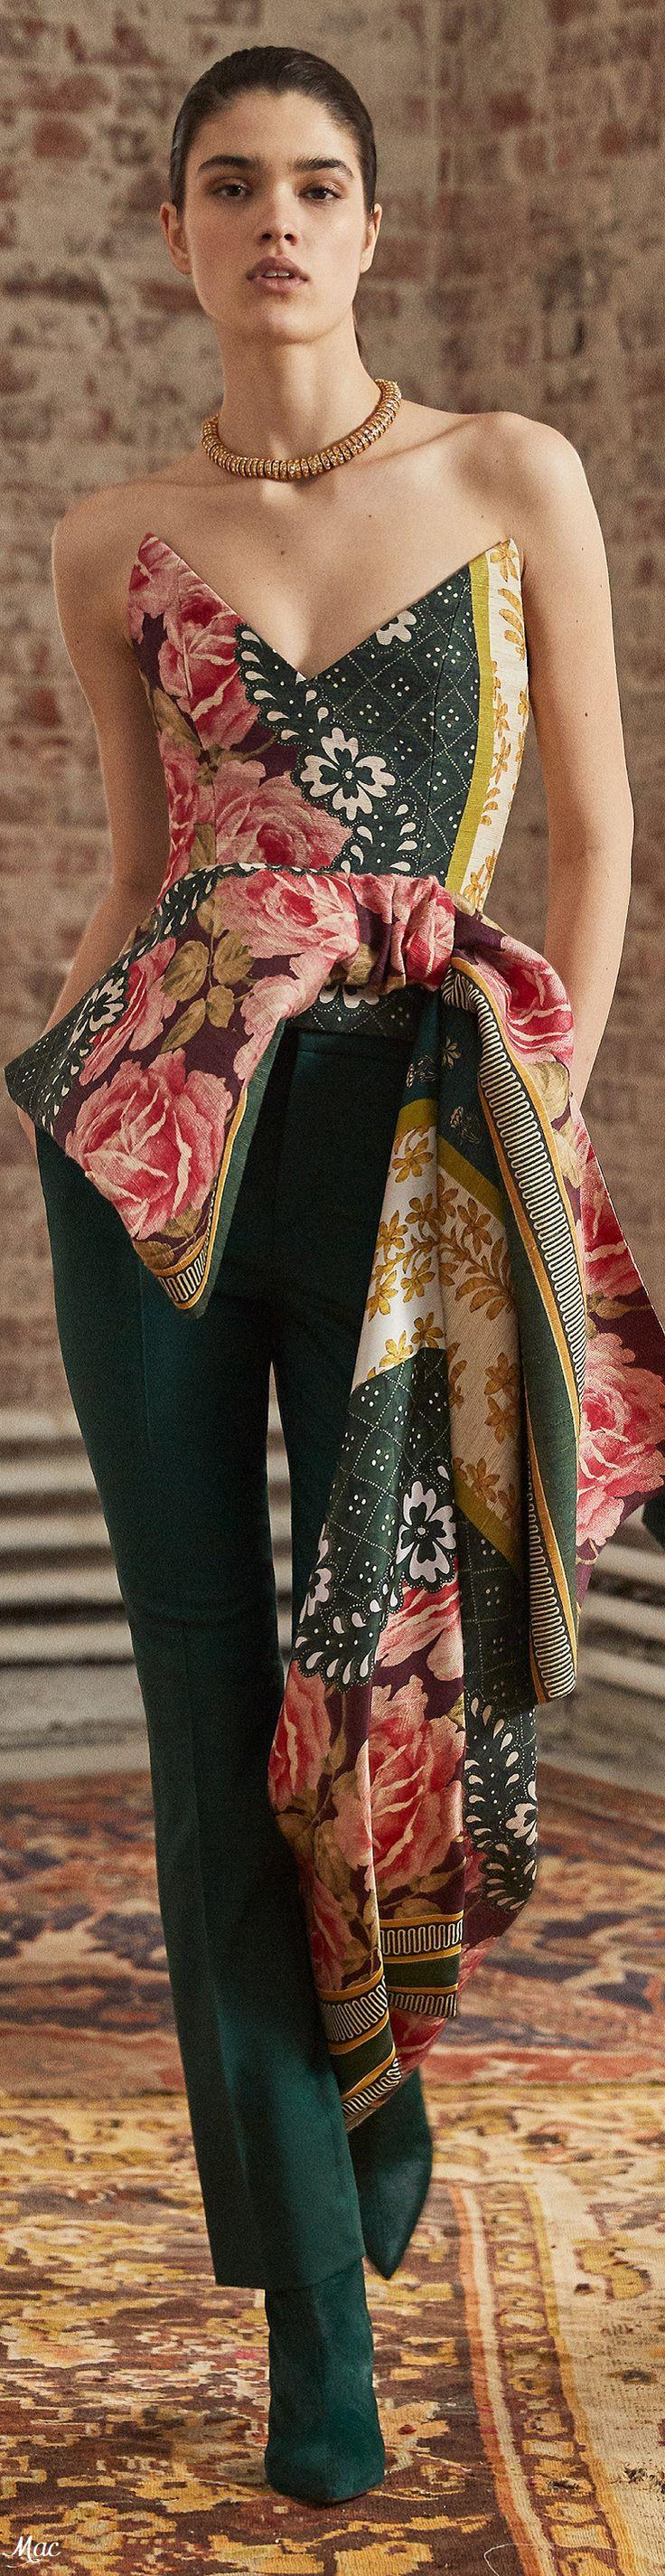 Oscar de la Renta Pre-Fall 2019 #prefall2019 #pf2019 #fashionshow #womenswear #v…